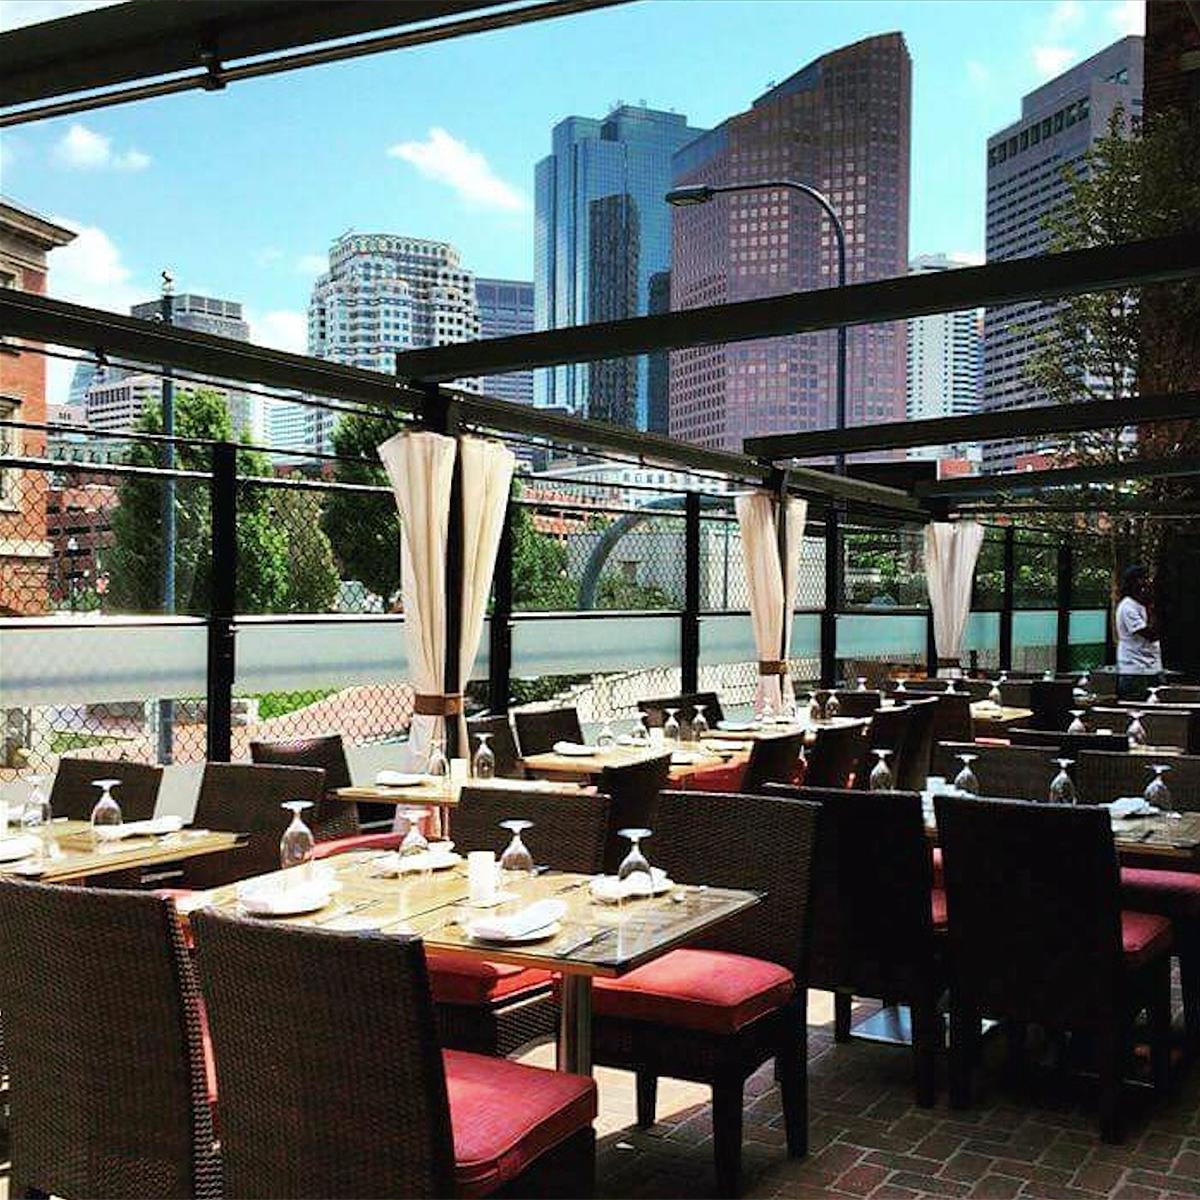 Mare-best-outdoor-dining-patio-deck-al-fresco